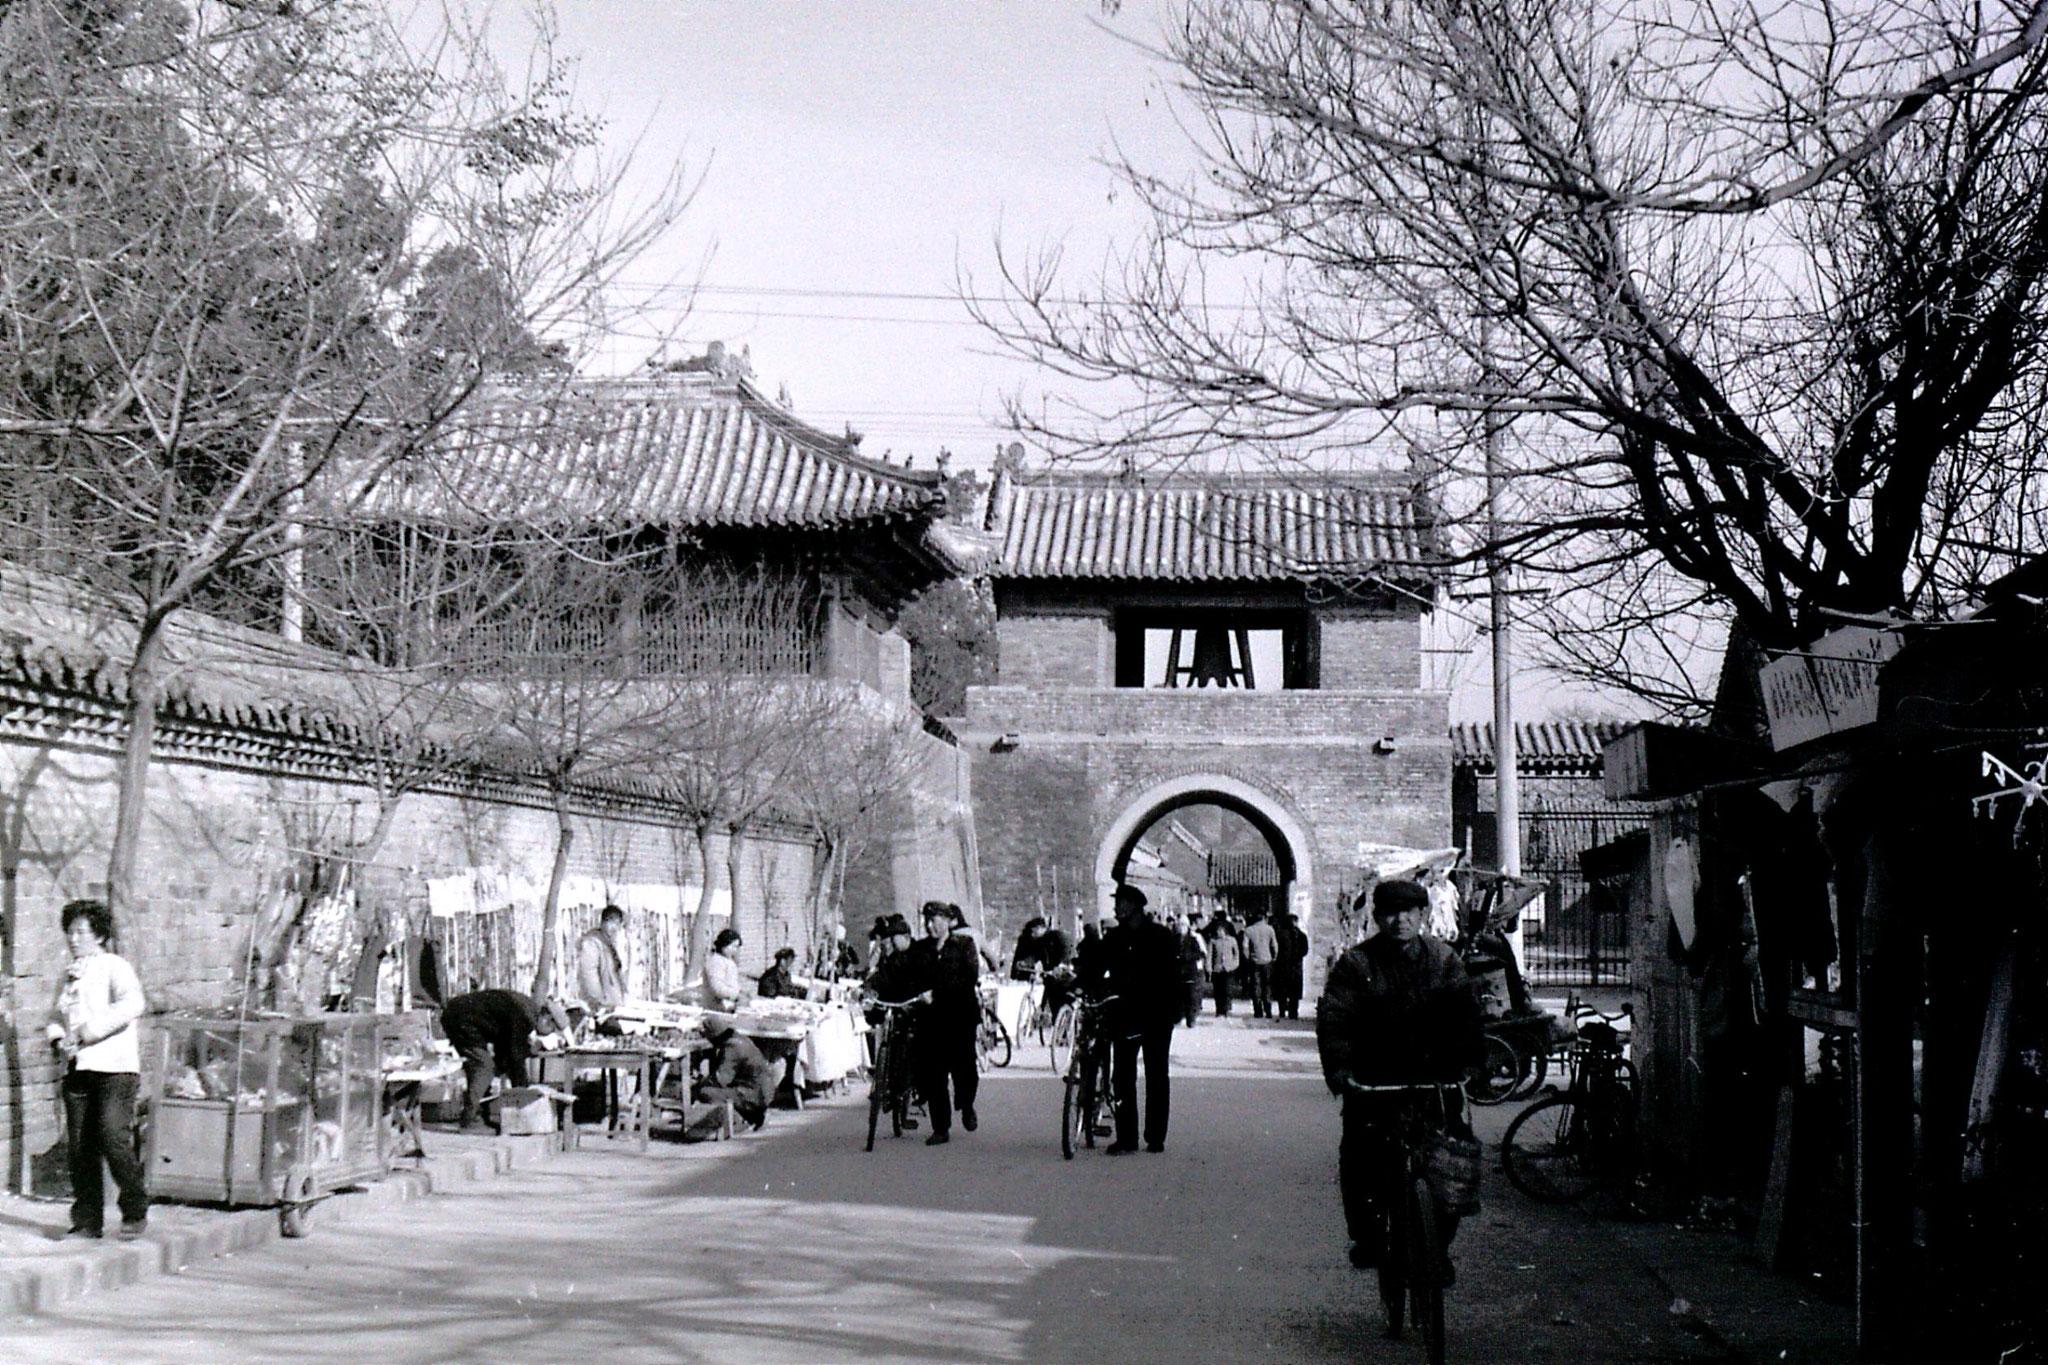 21/2/1989: 24: Qufu bell tower